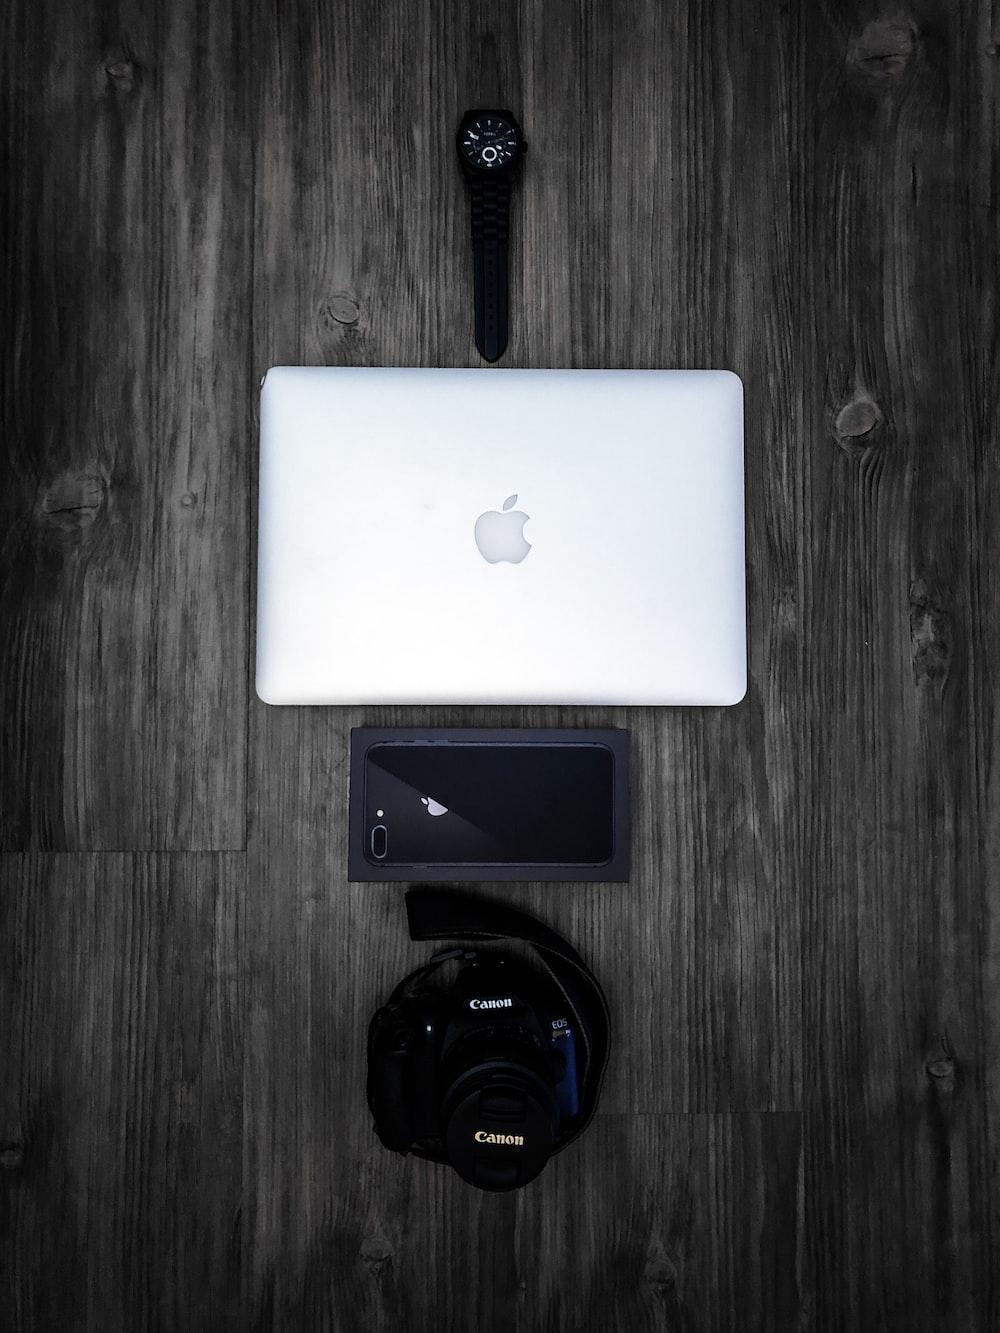 silver Macbook on grey table